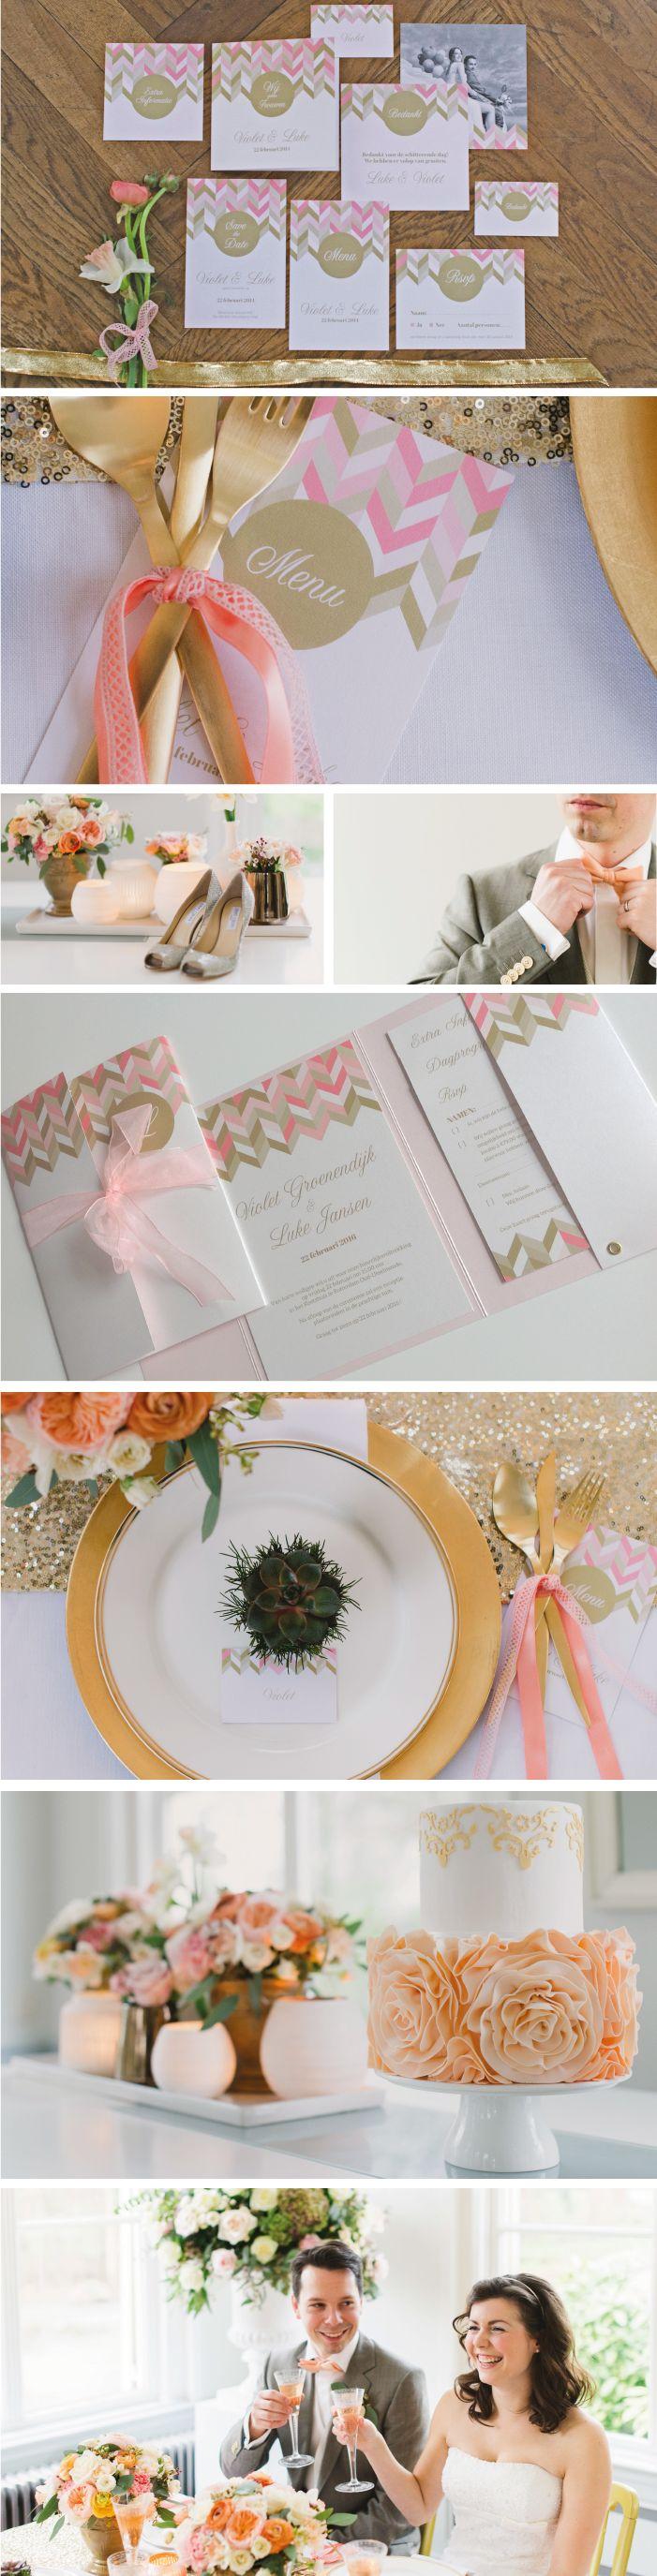 18 Best Trouwkaarten Images On Pinterest Menu Wedding Cards And